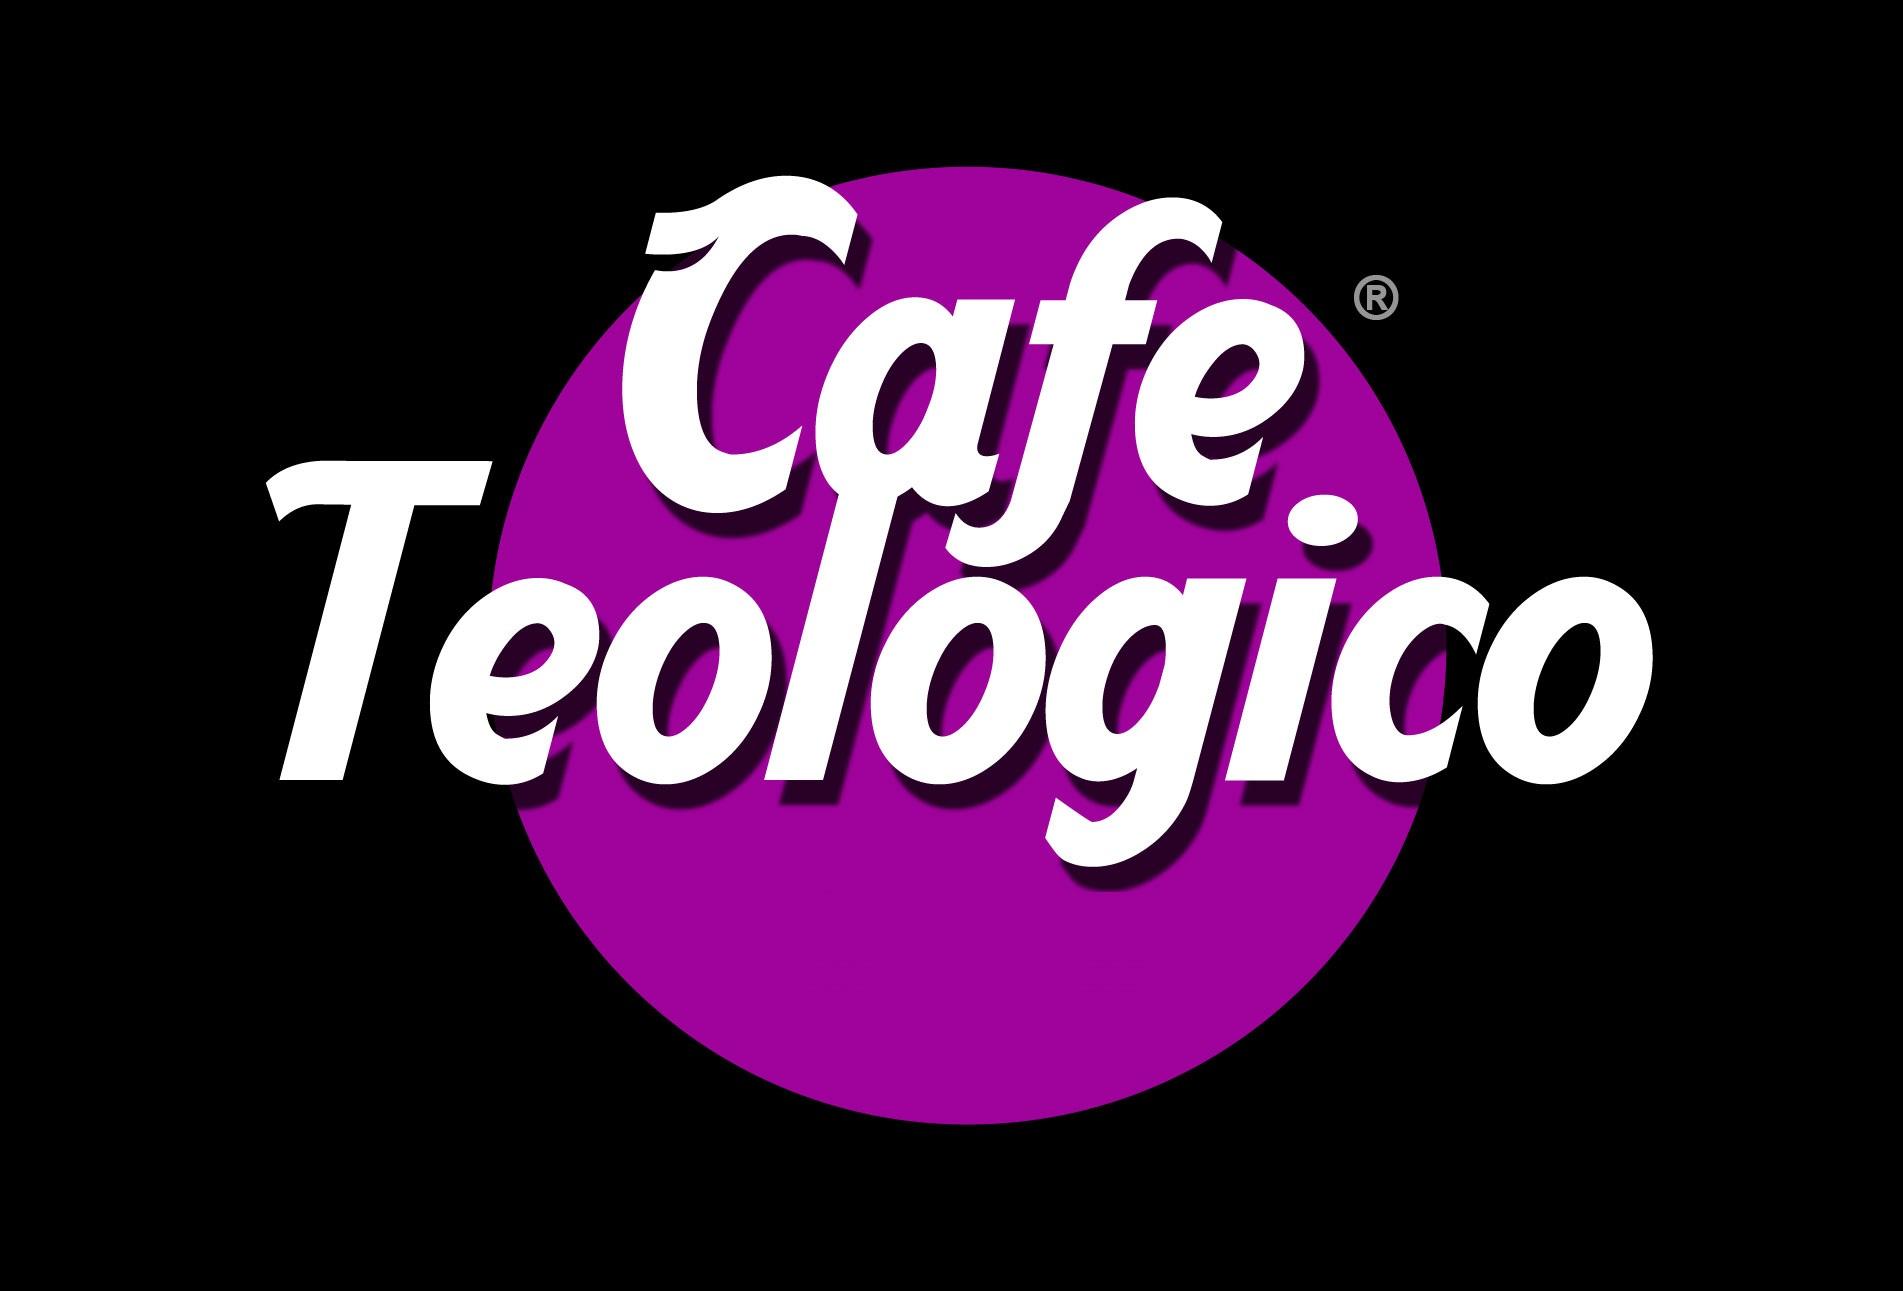 cafe teologico